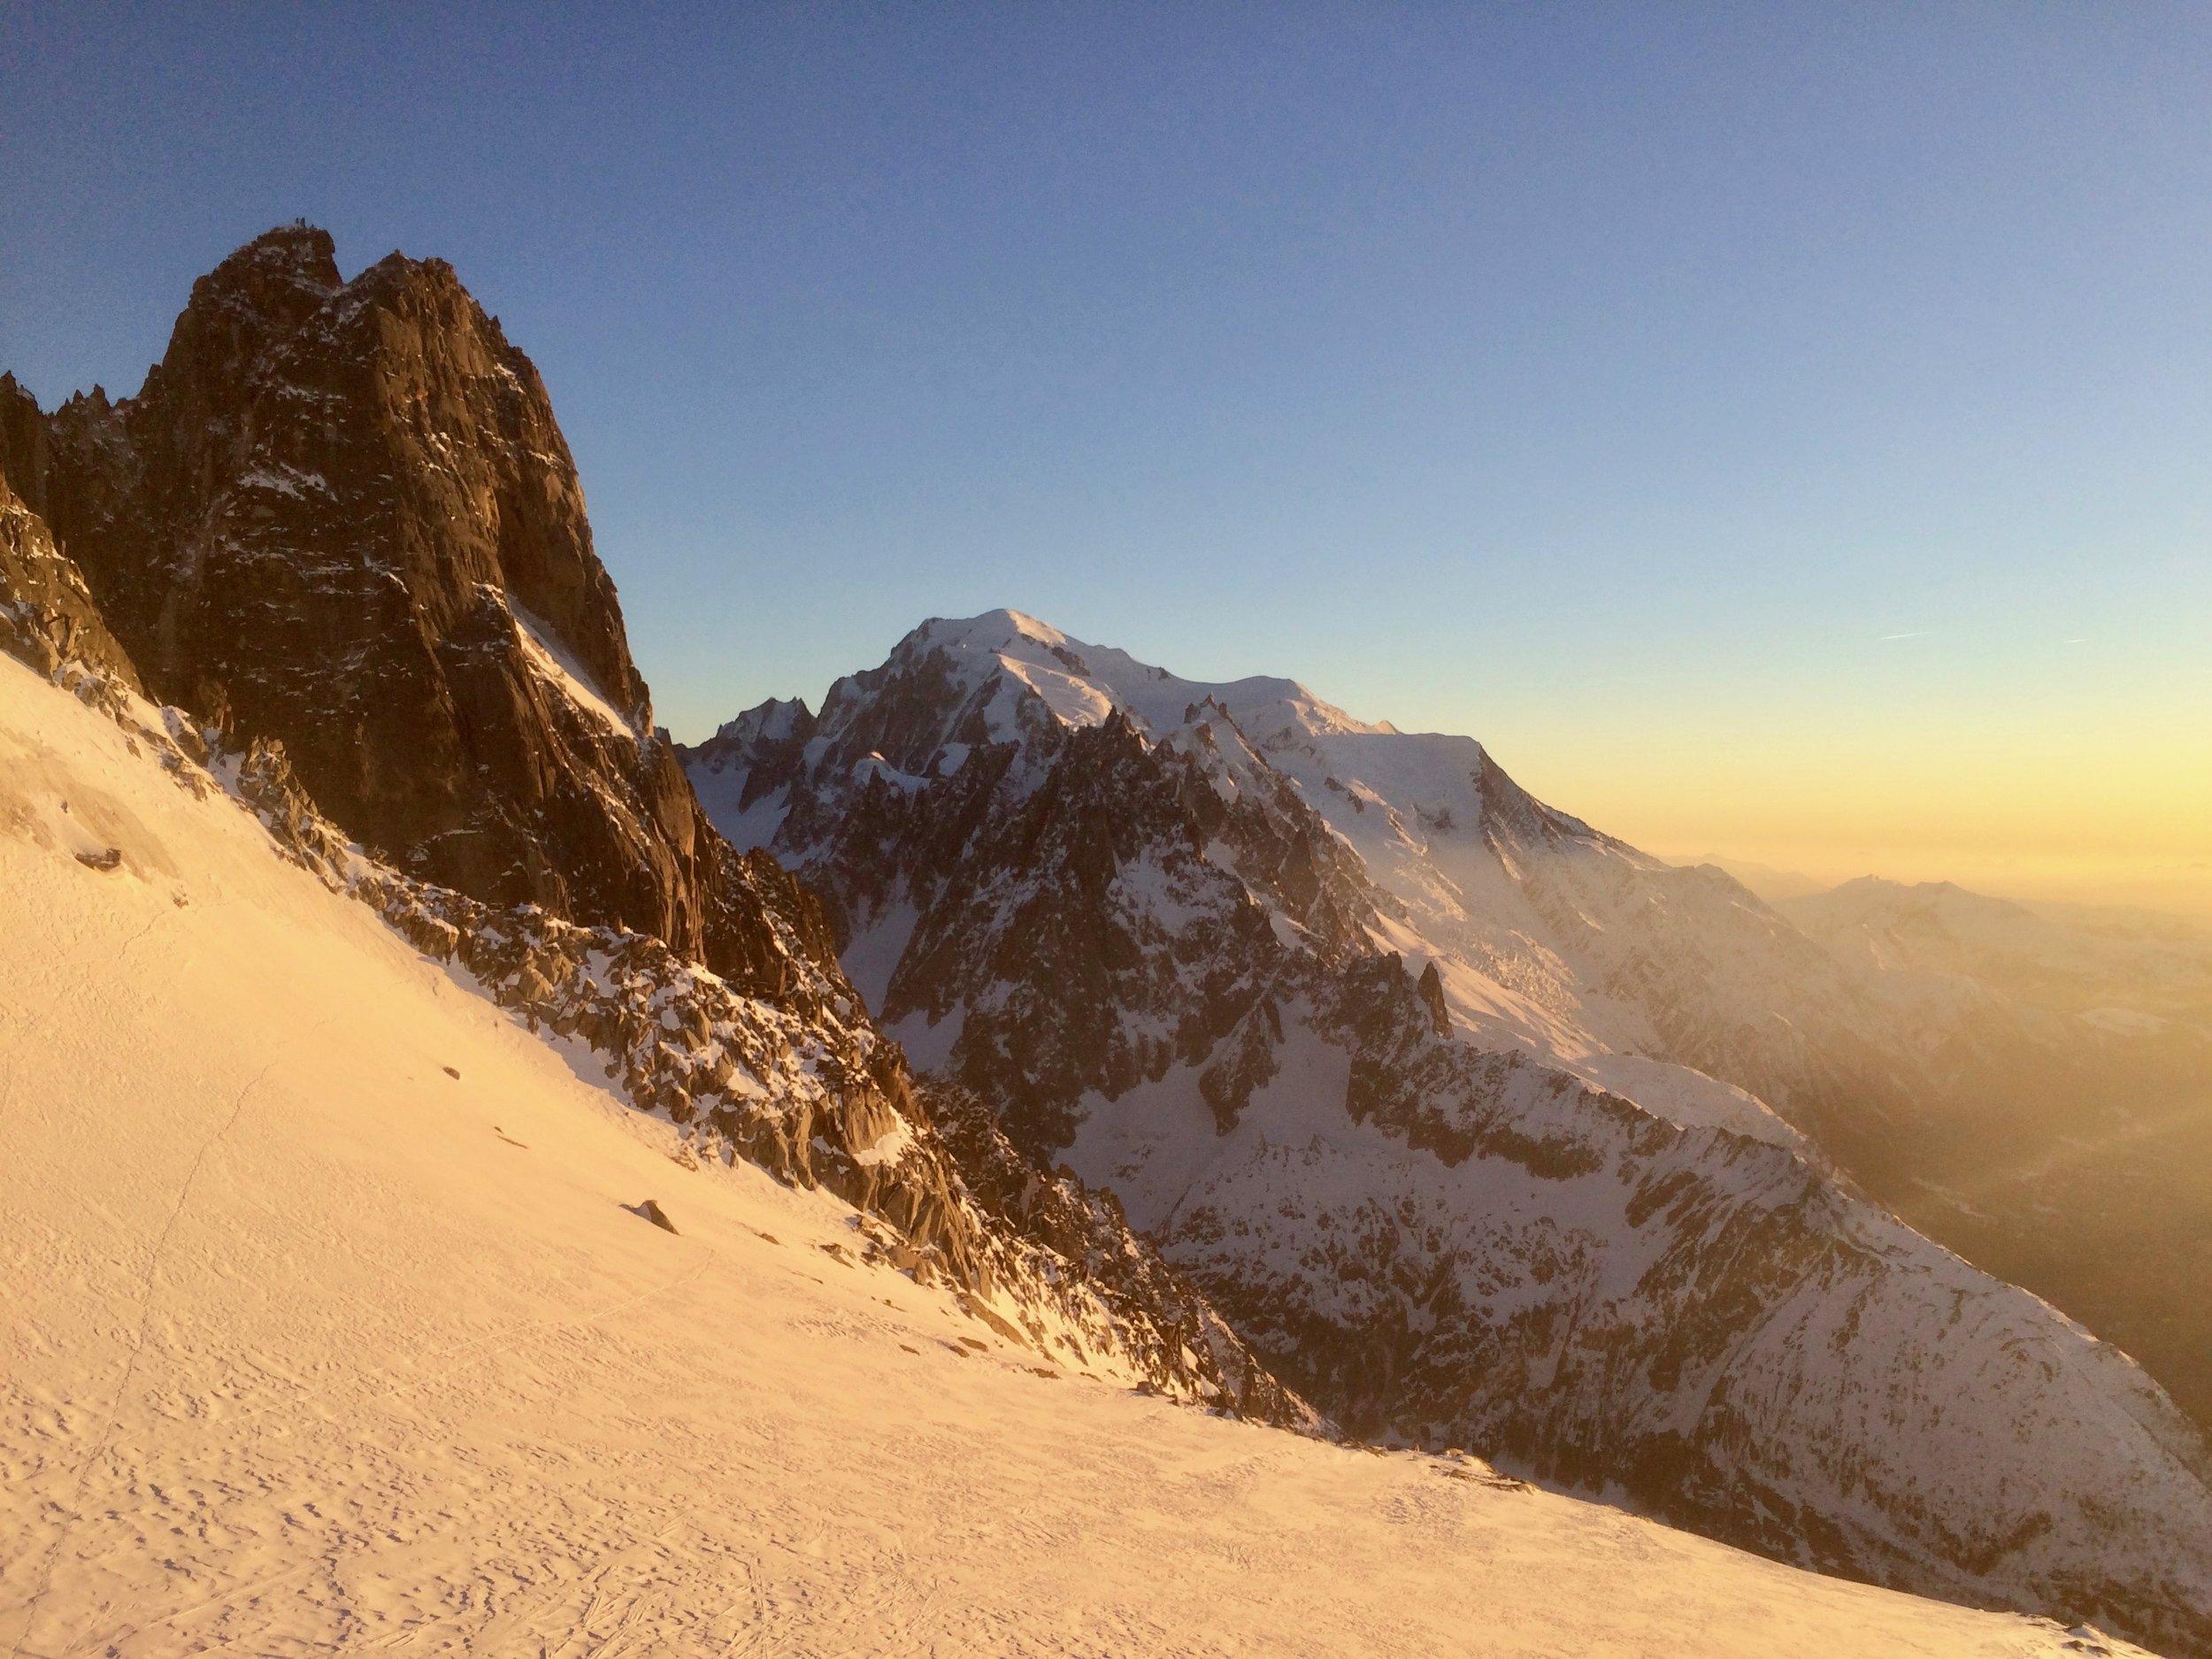 Le dru and mont blanc at sunset. chamonix